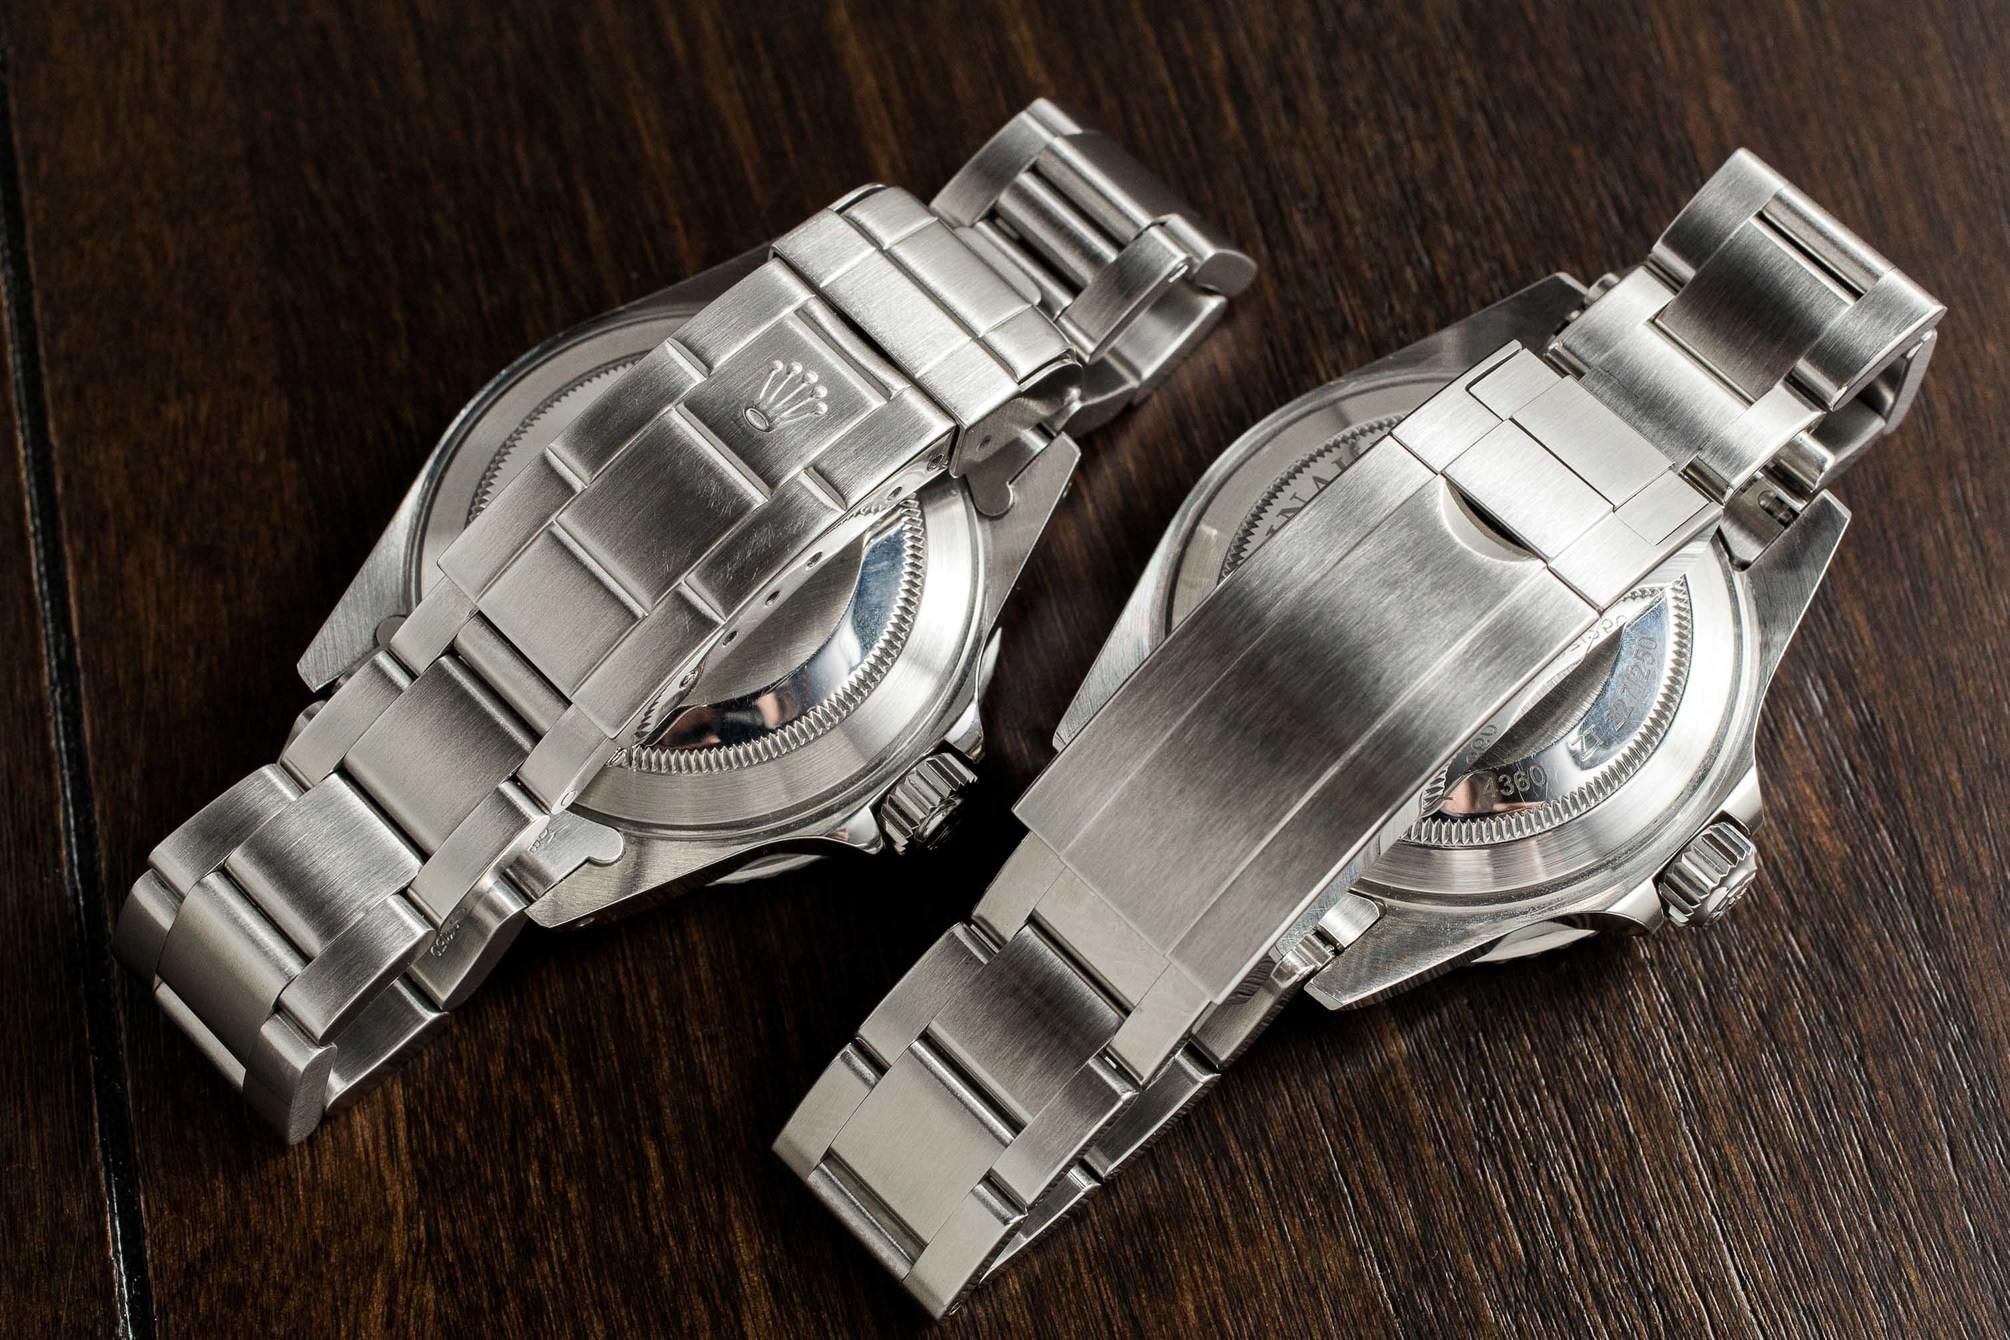 Ginault Ocean Rover vs Rolex Submariner bracelet